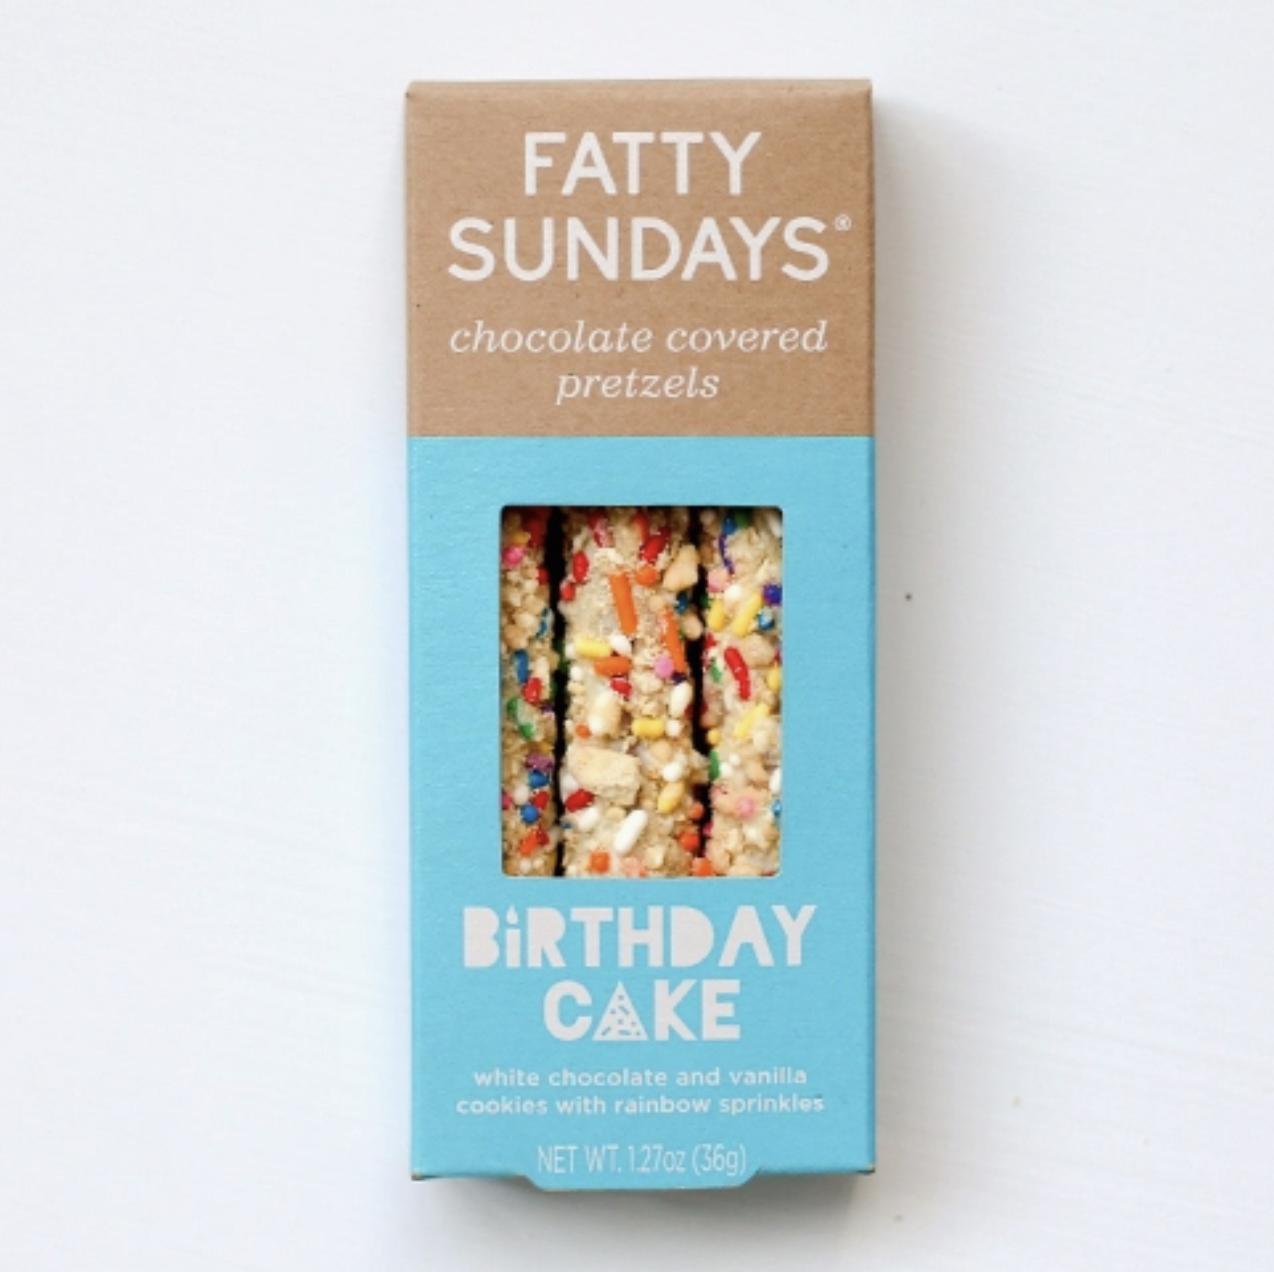 Fatty Sundays Birthday Cake Chocolate Covered Pretzels